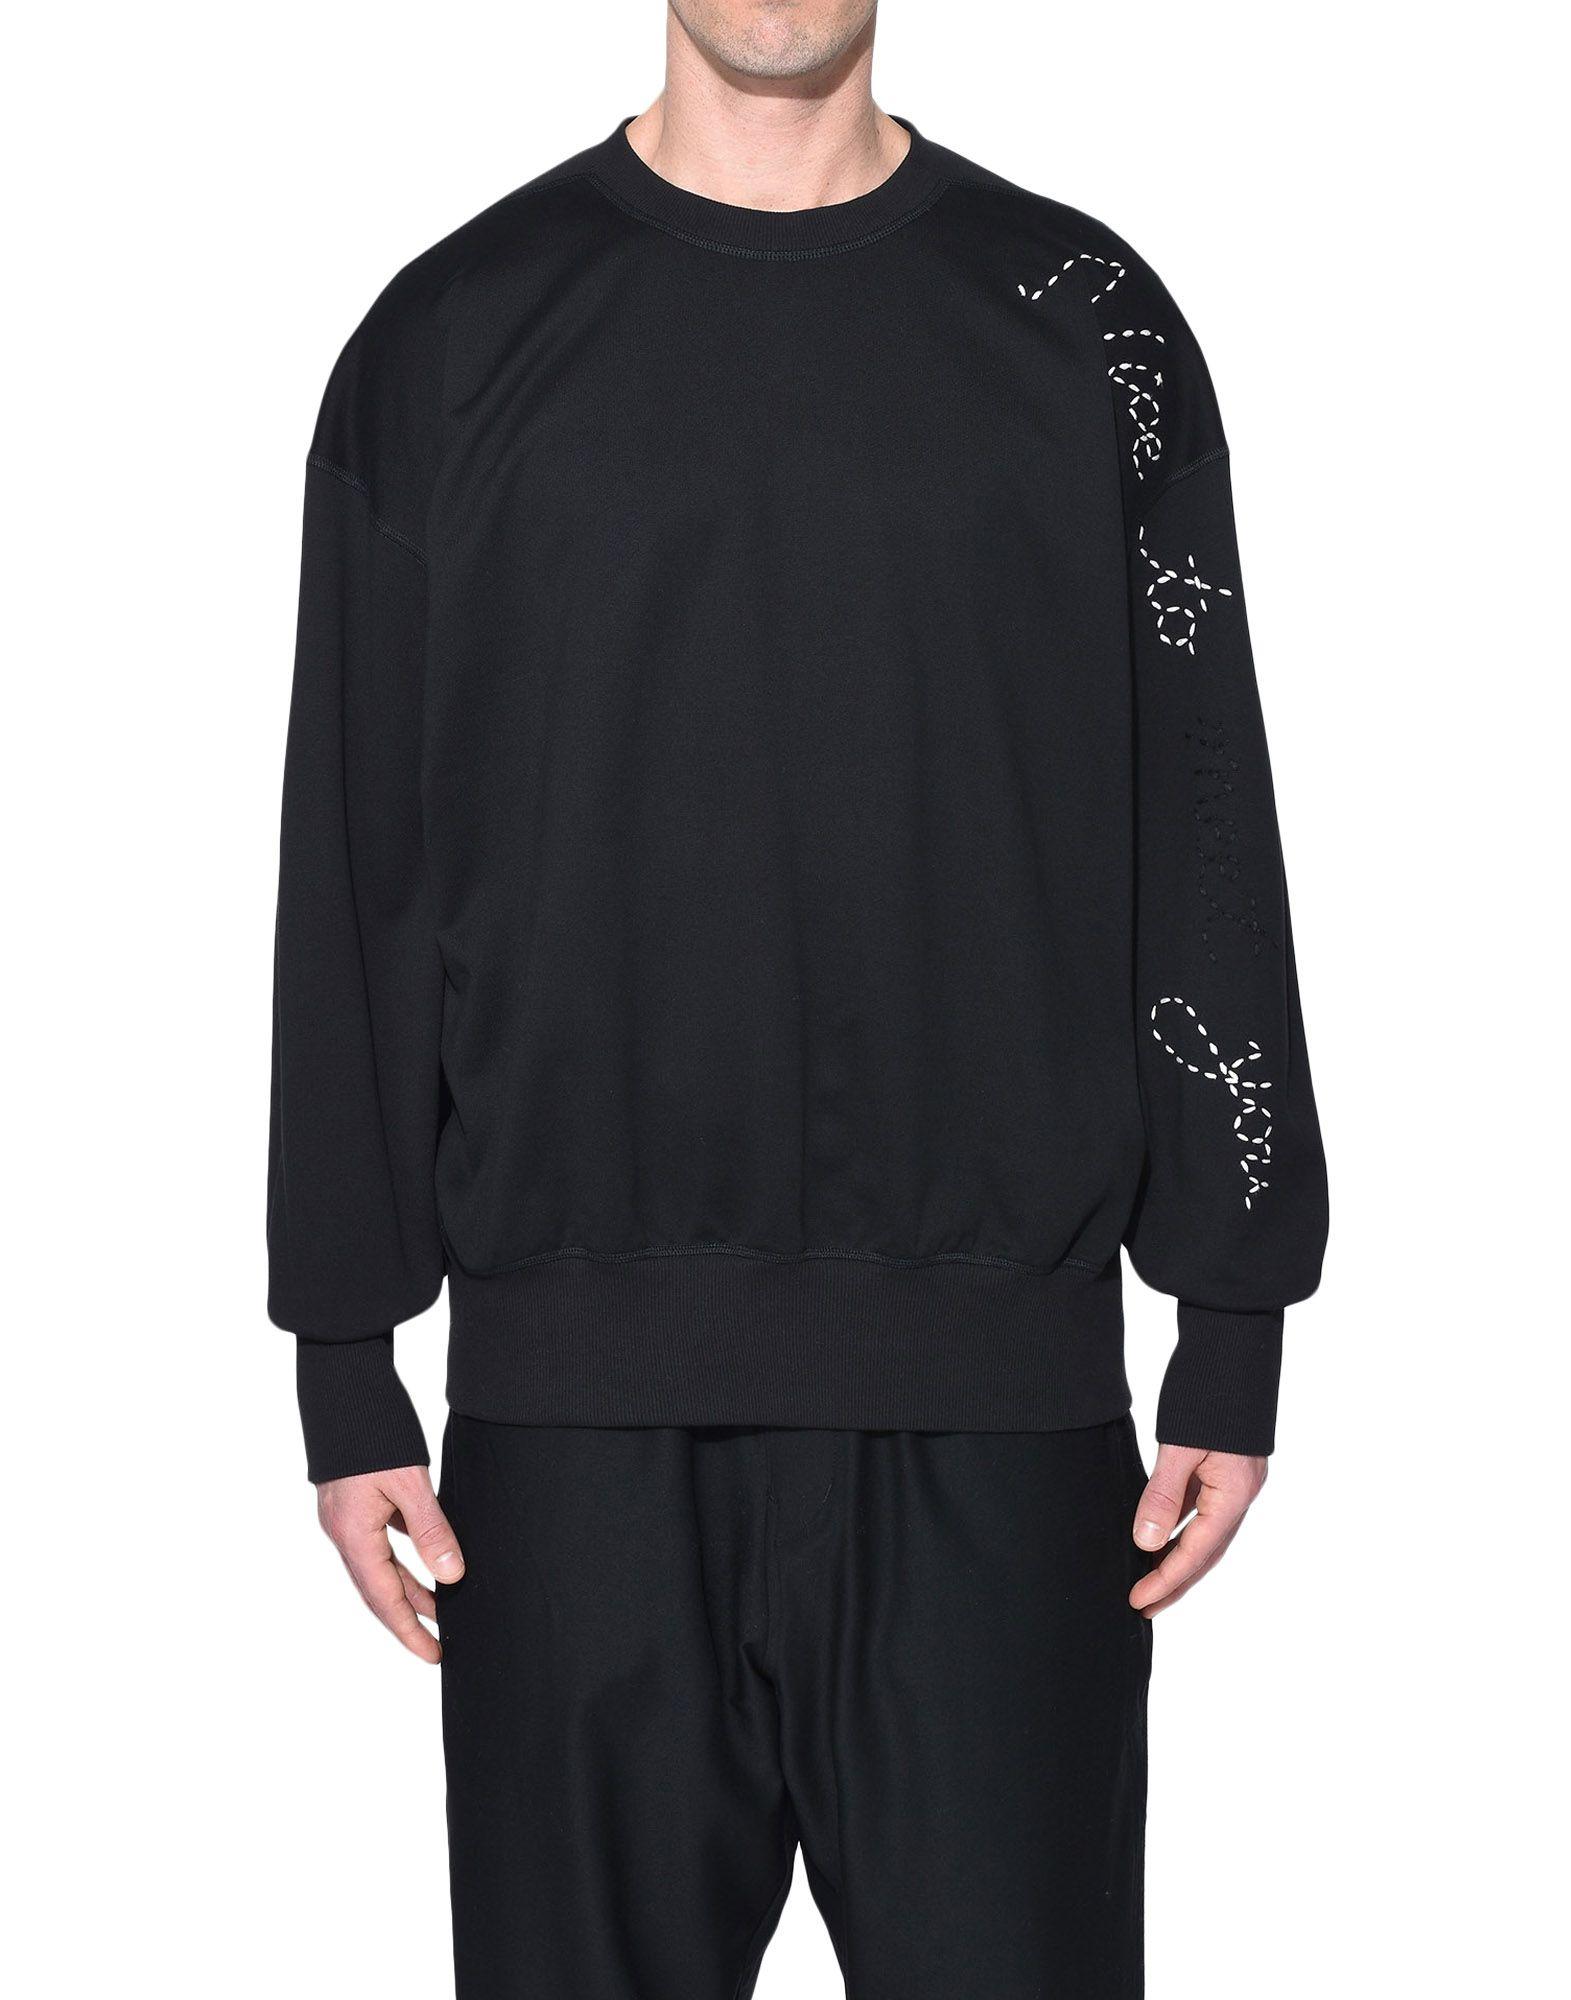 Y-3 Y-3 Sashiko Slogan Sweater Sweatshirt Man r